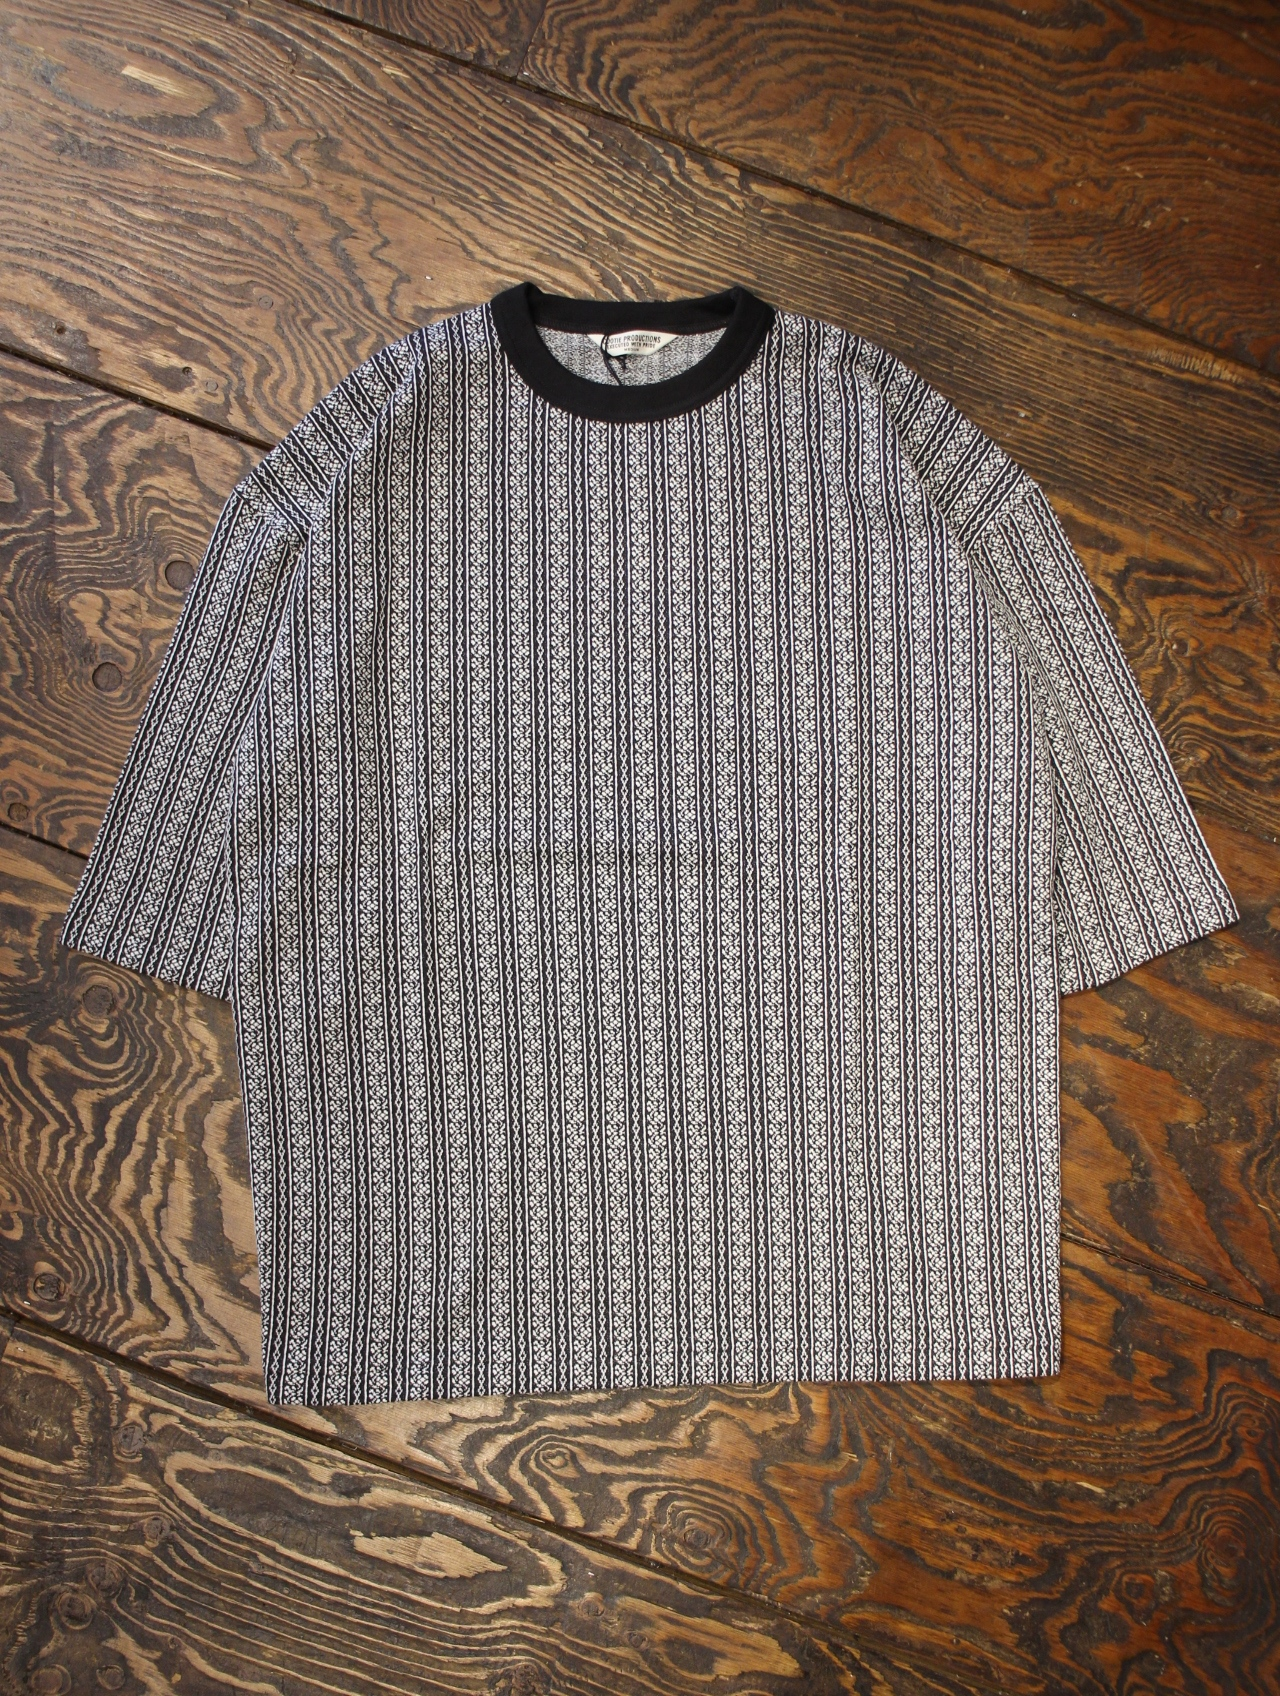 COOTIE  「 Jacquard Stripe Oversized S/S Tee」 ジャガードストライプオーバーサイズティーシャツ